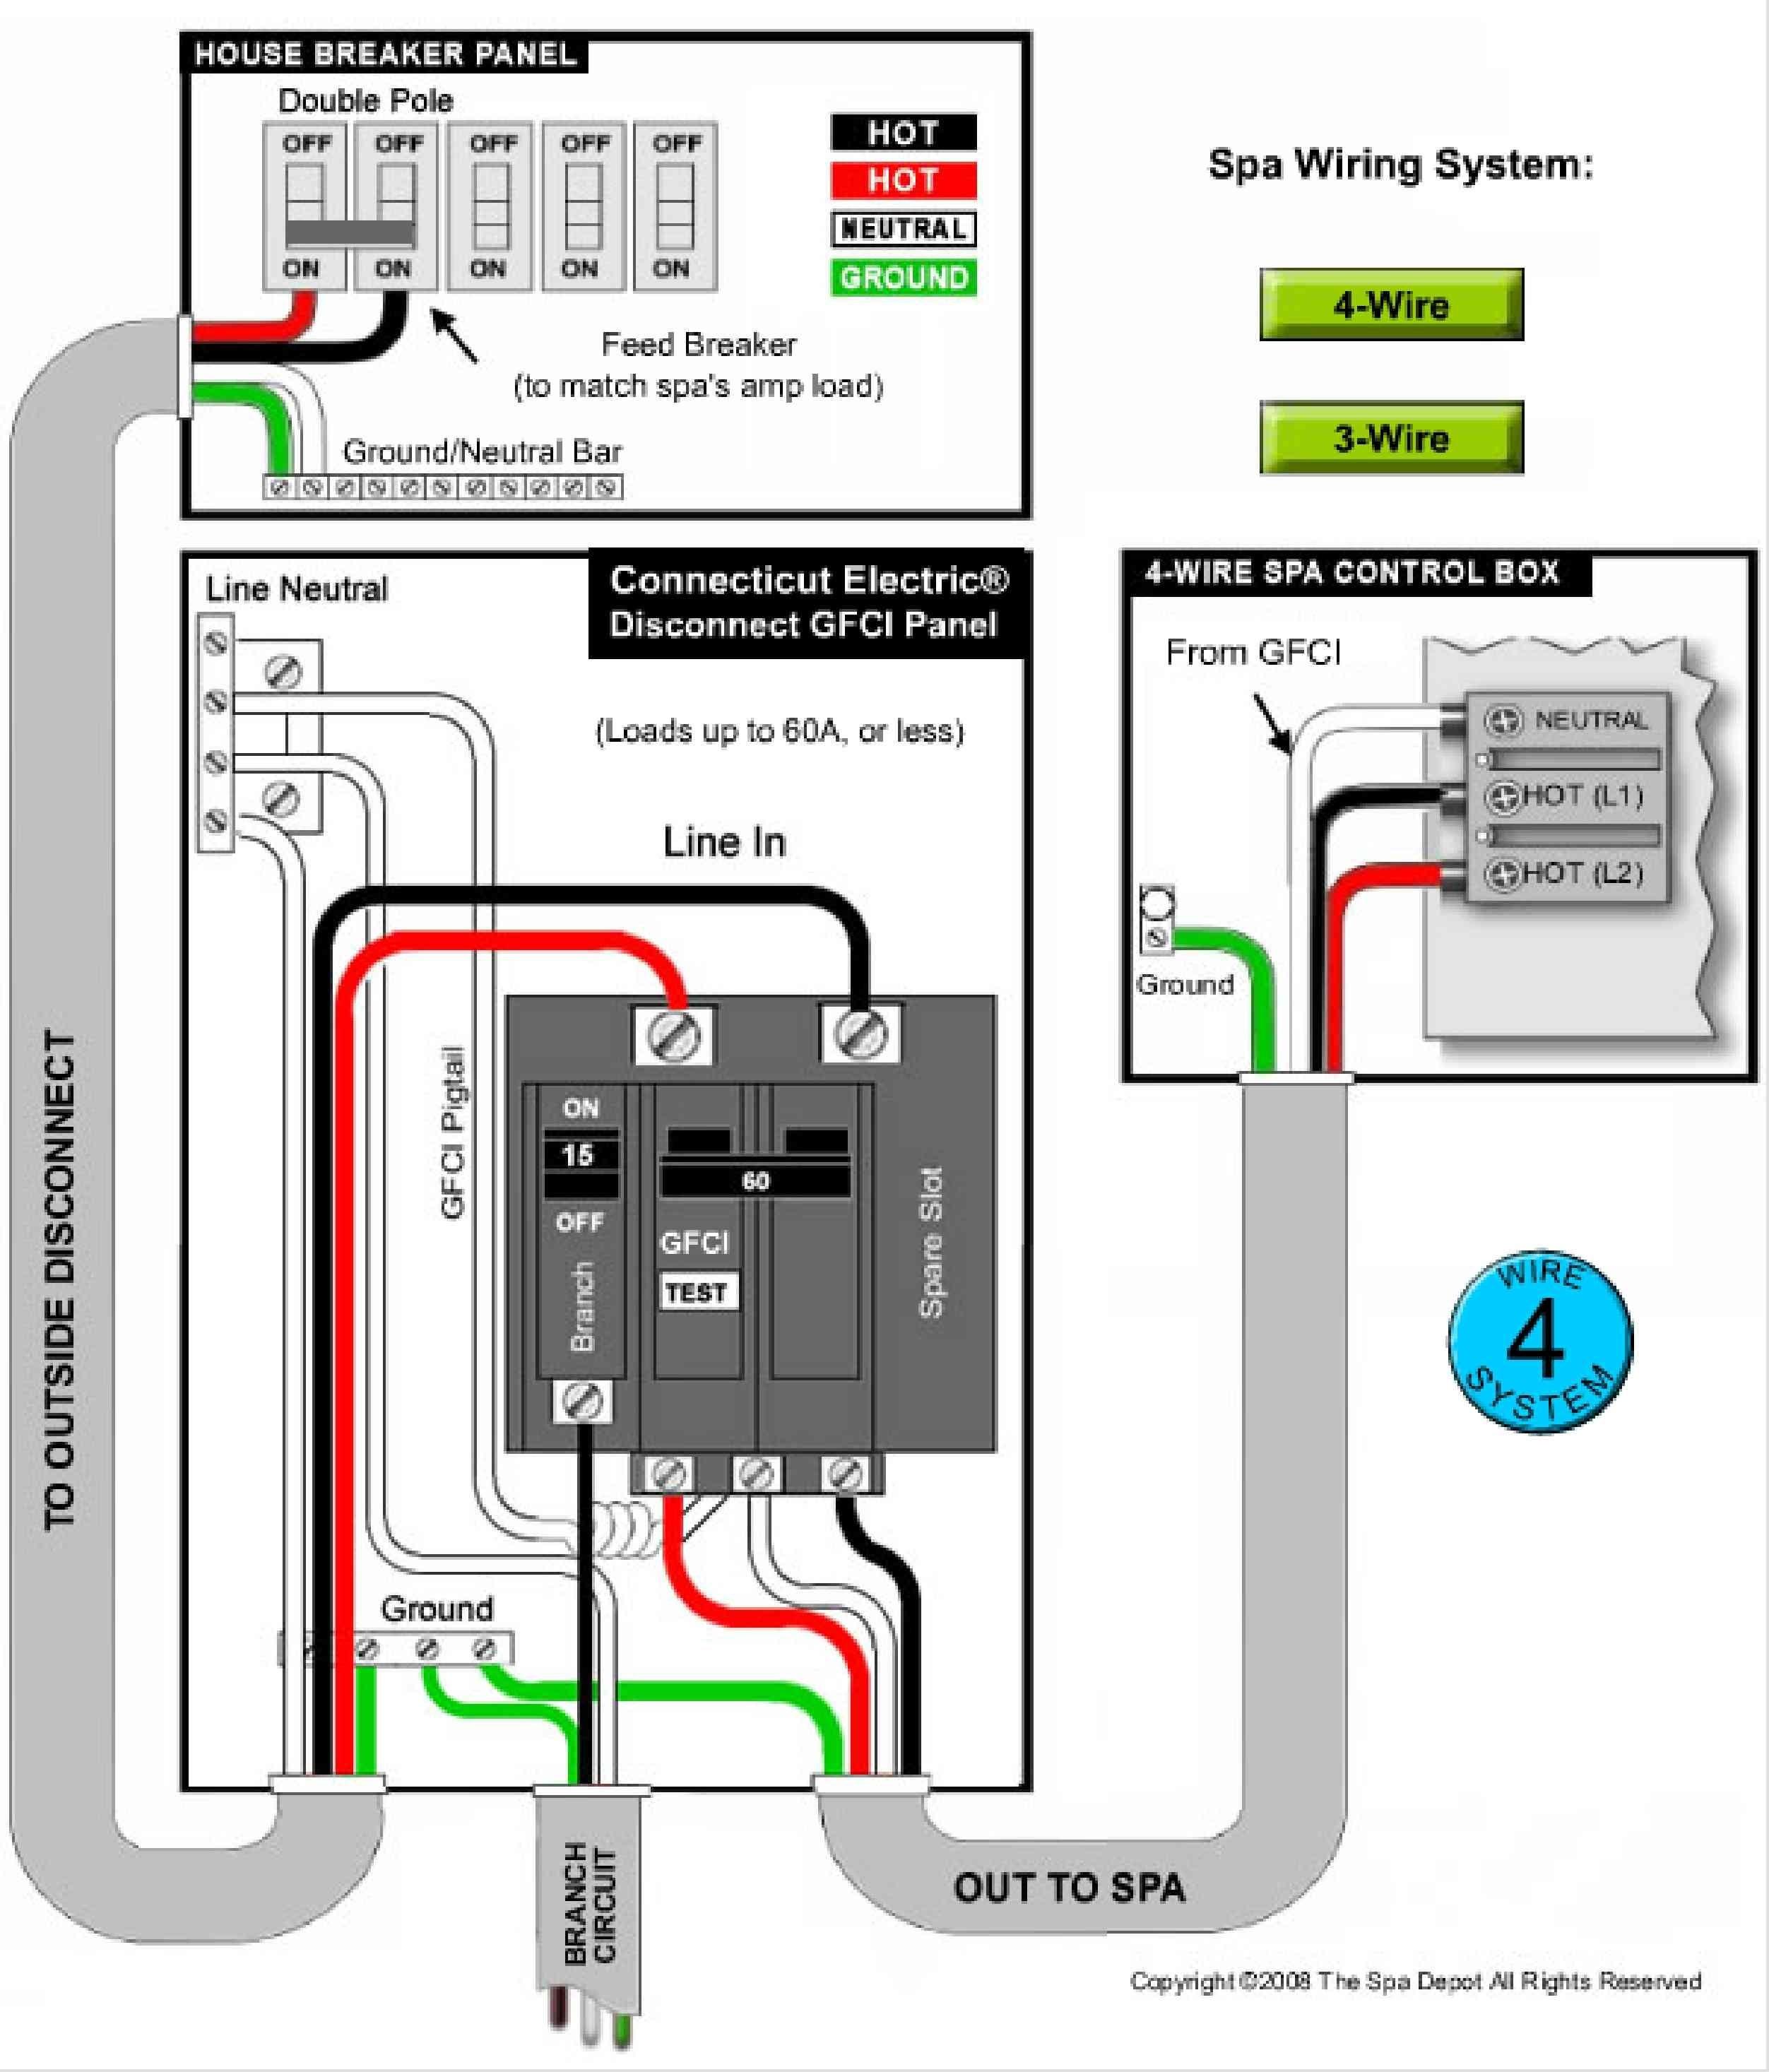 hot tub wiring schematic free wiring diagram rh ricardolevinsmorales com